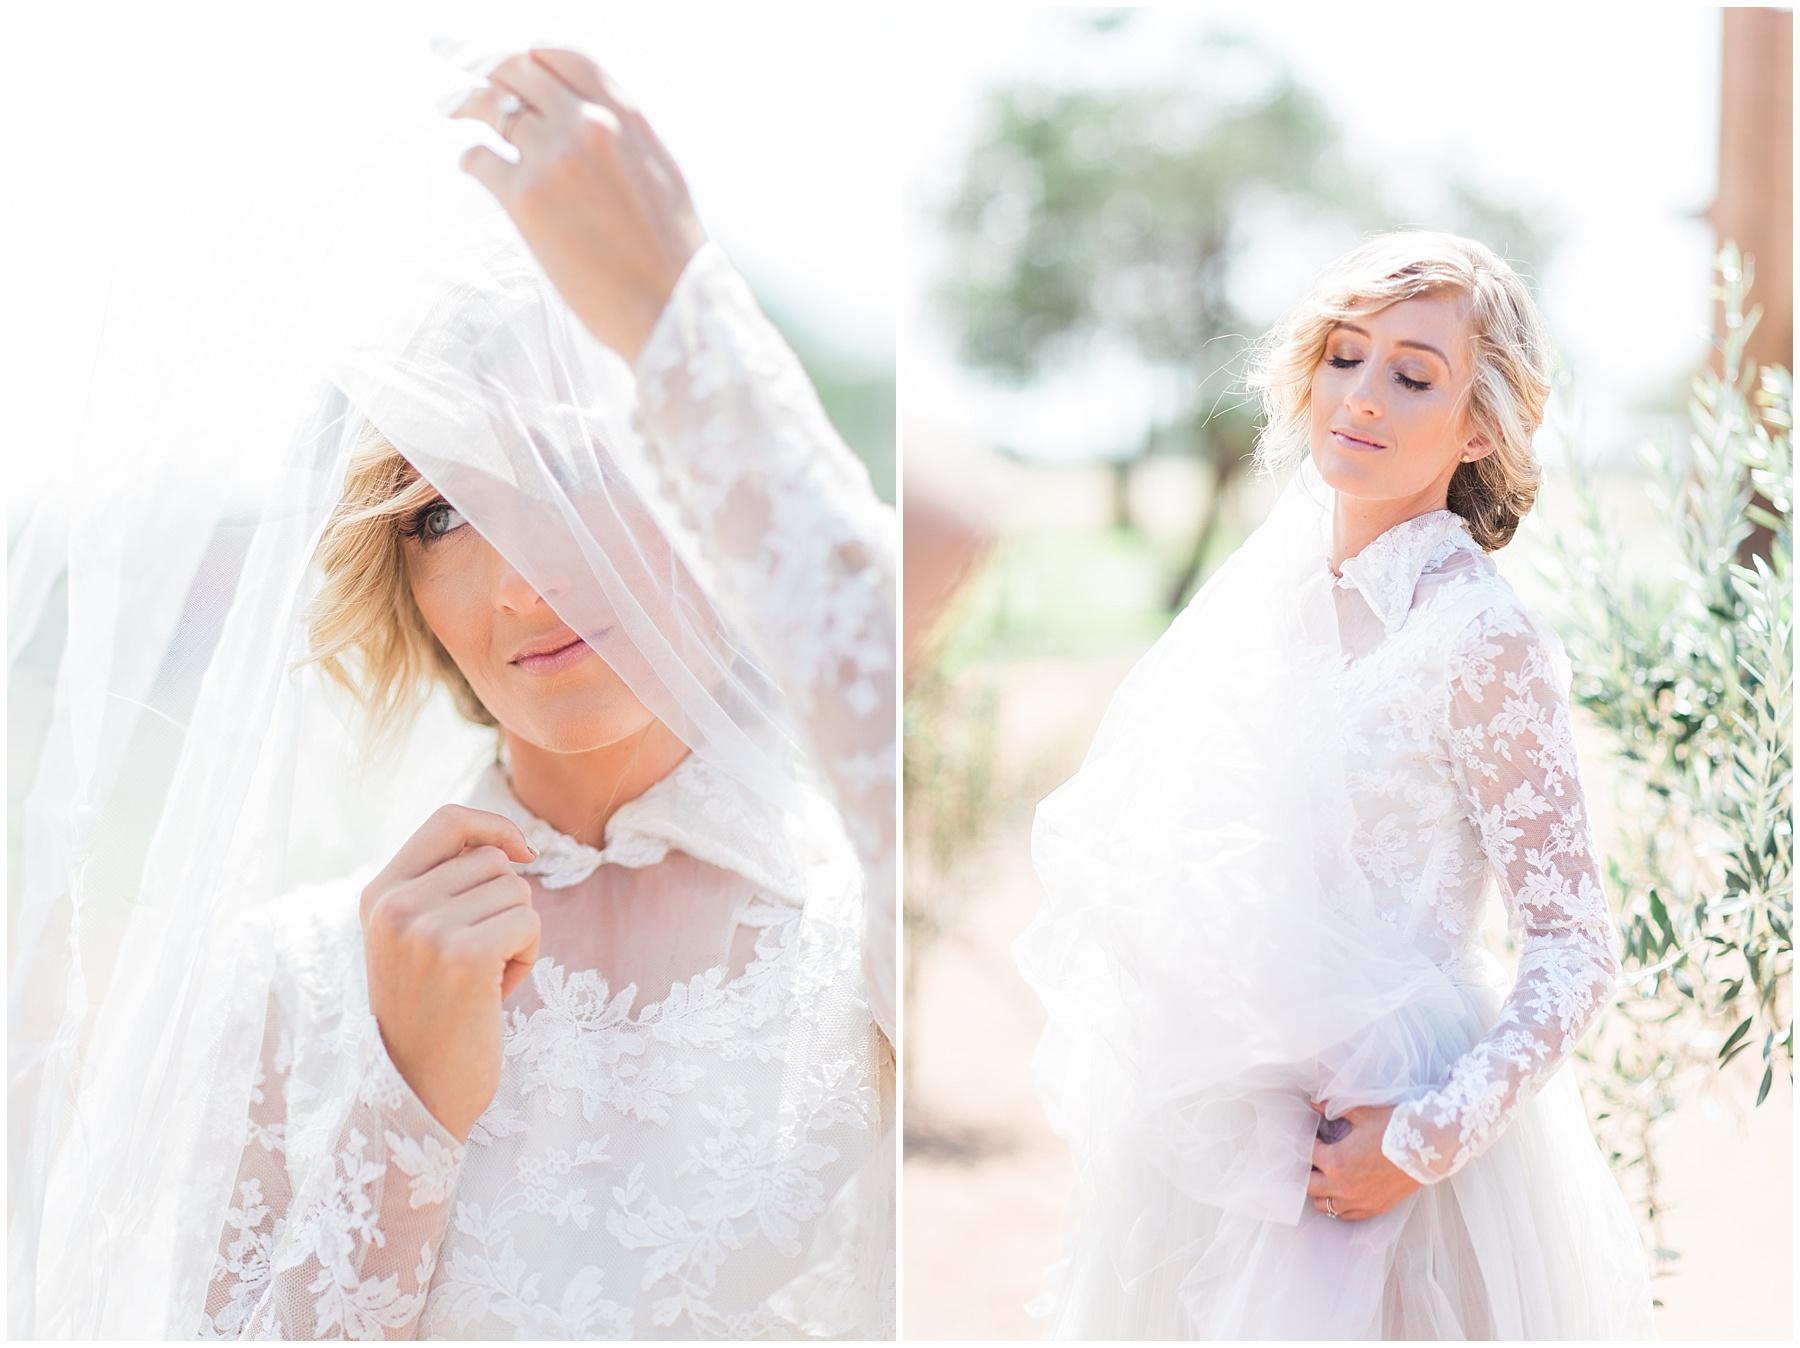 AliciaLandman_JoleneandZander_Wedding_The Pretty Blog_0428.jpg